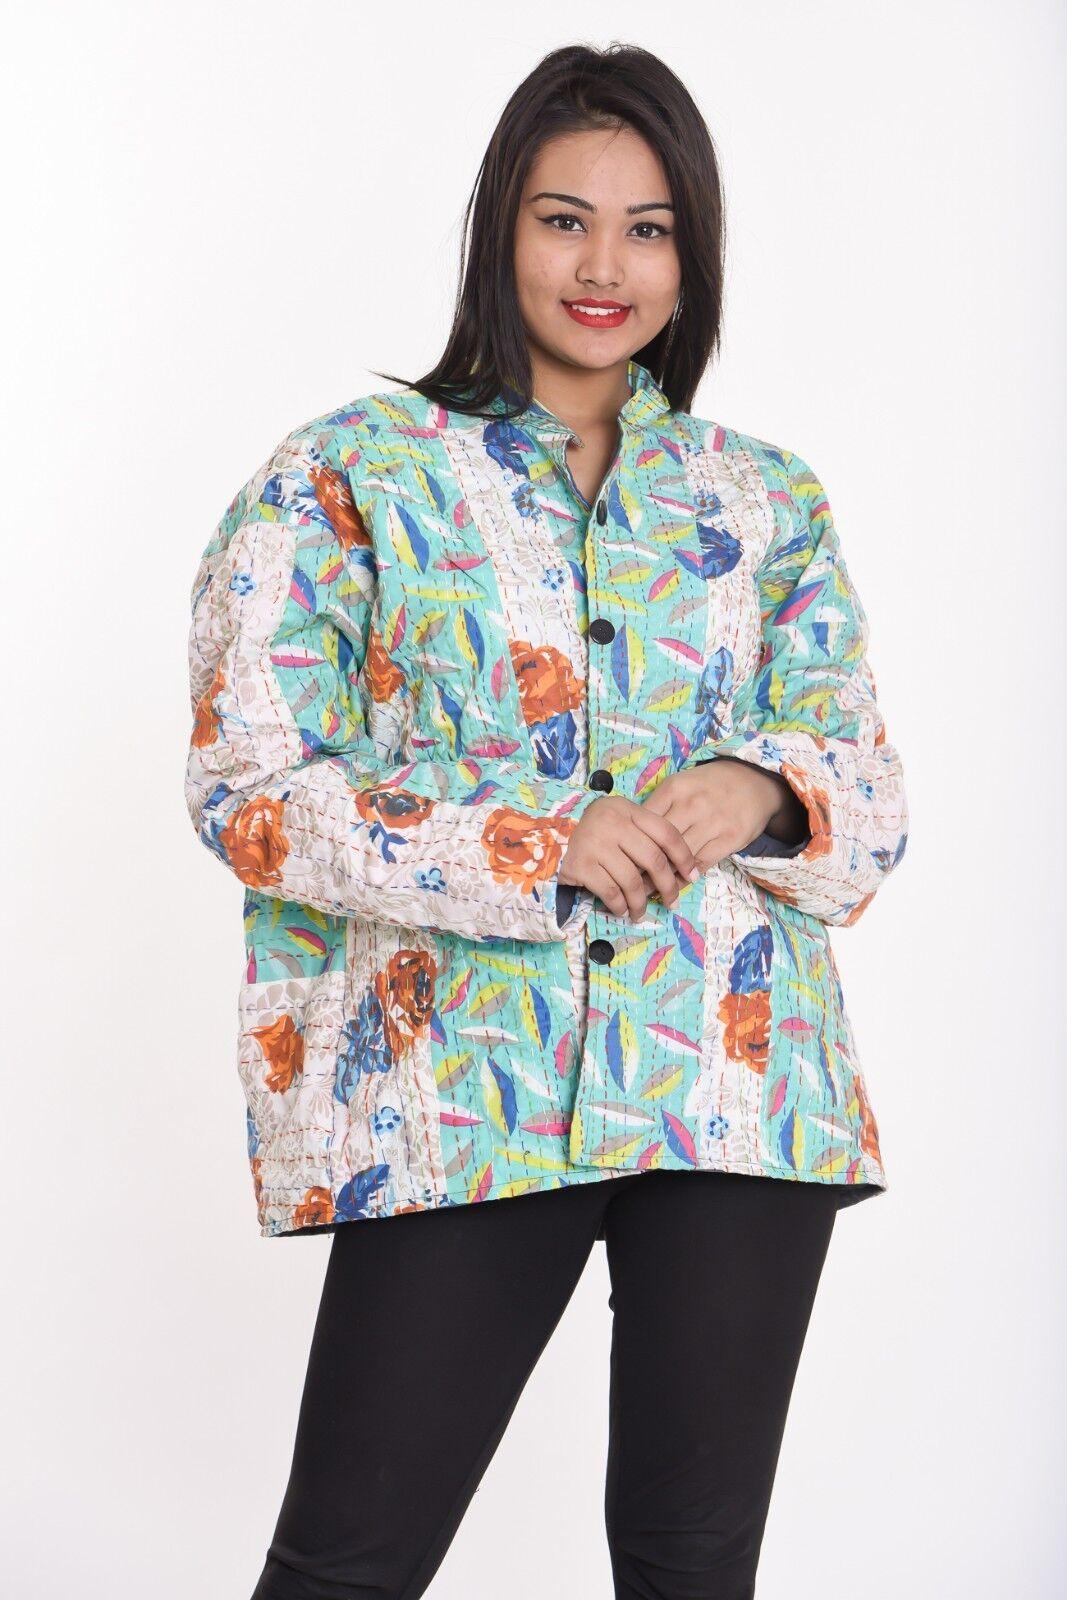 Indian cotton women's jacket Coat winter warm outwear Kantha XXS-10XL